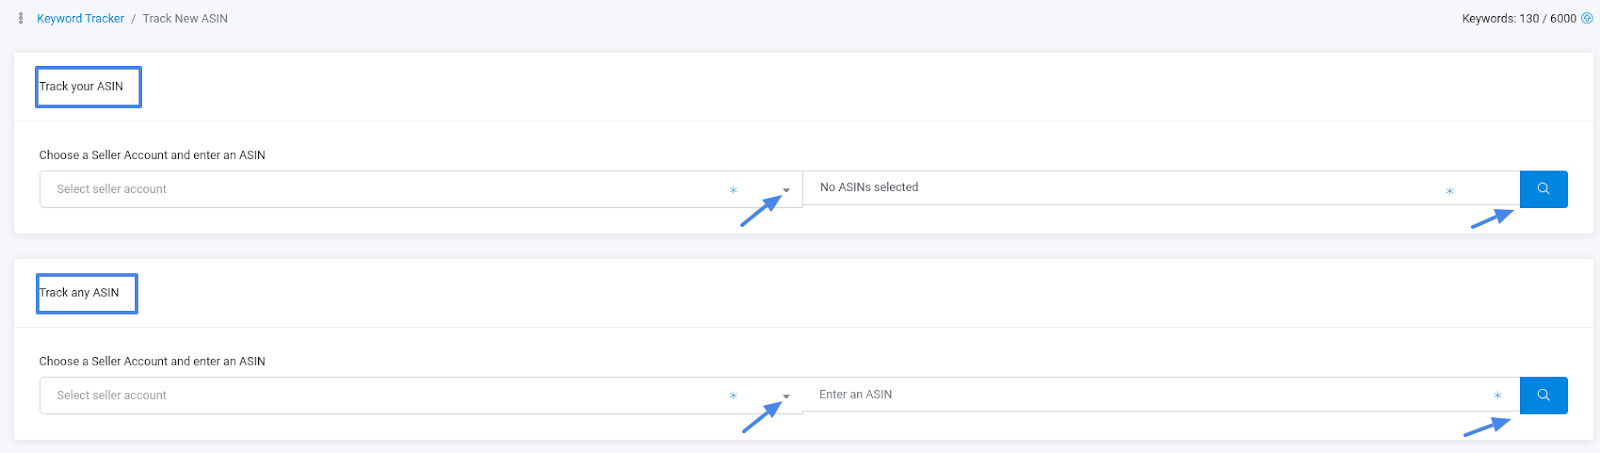 keyword-tracking-track- ASINs